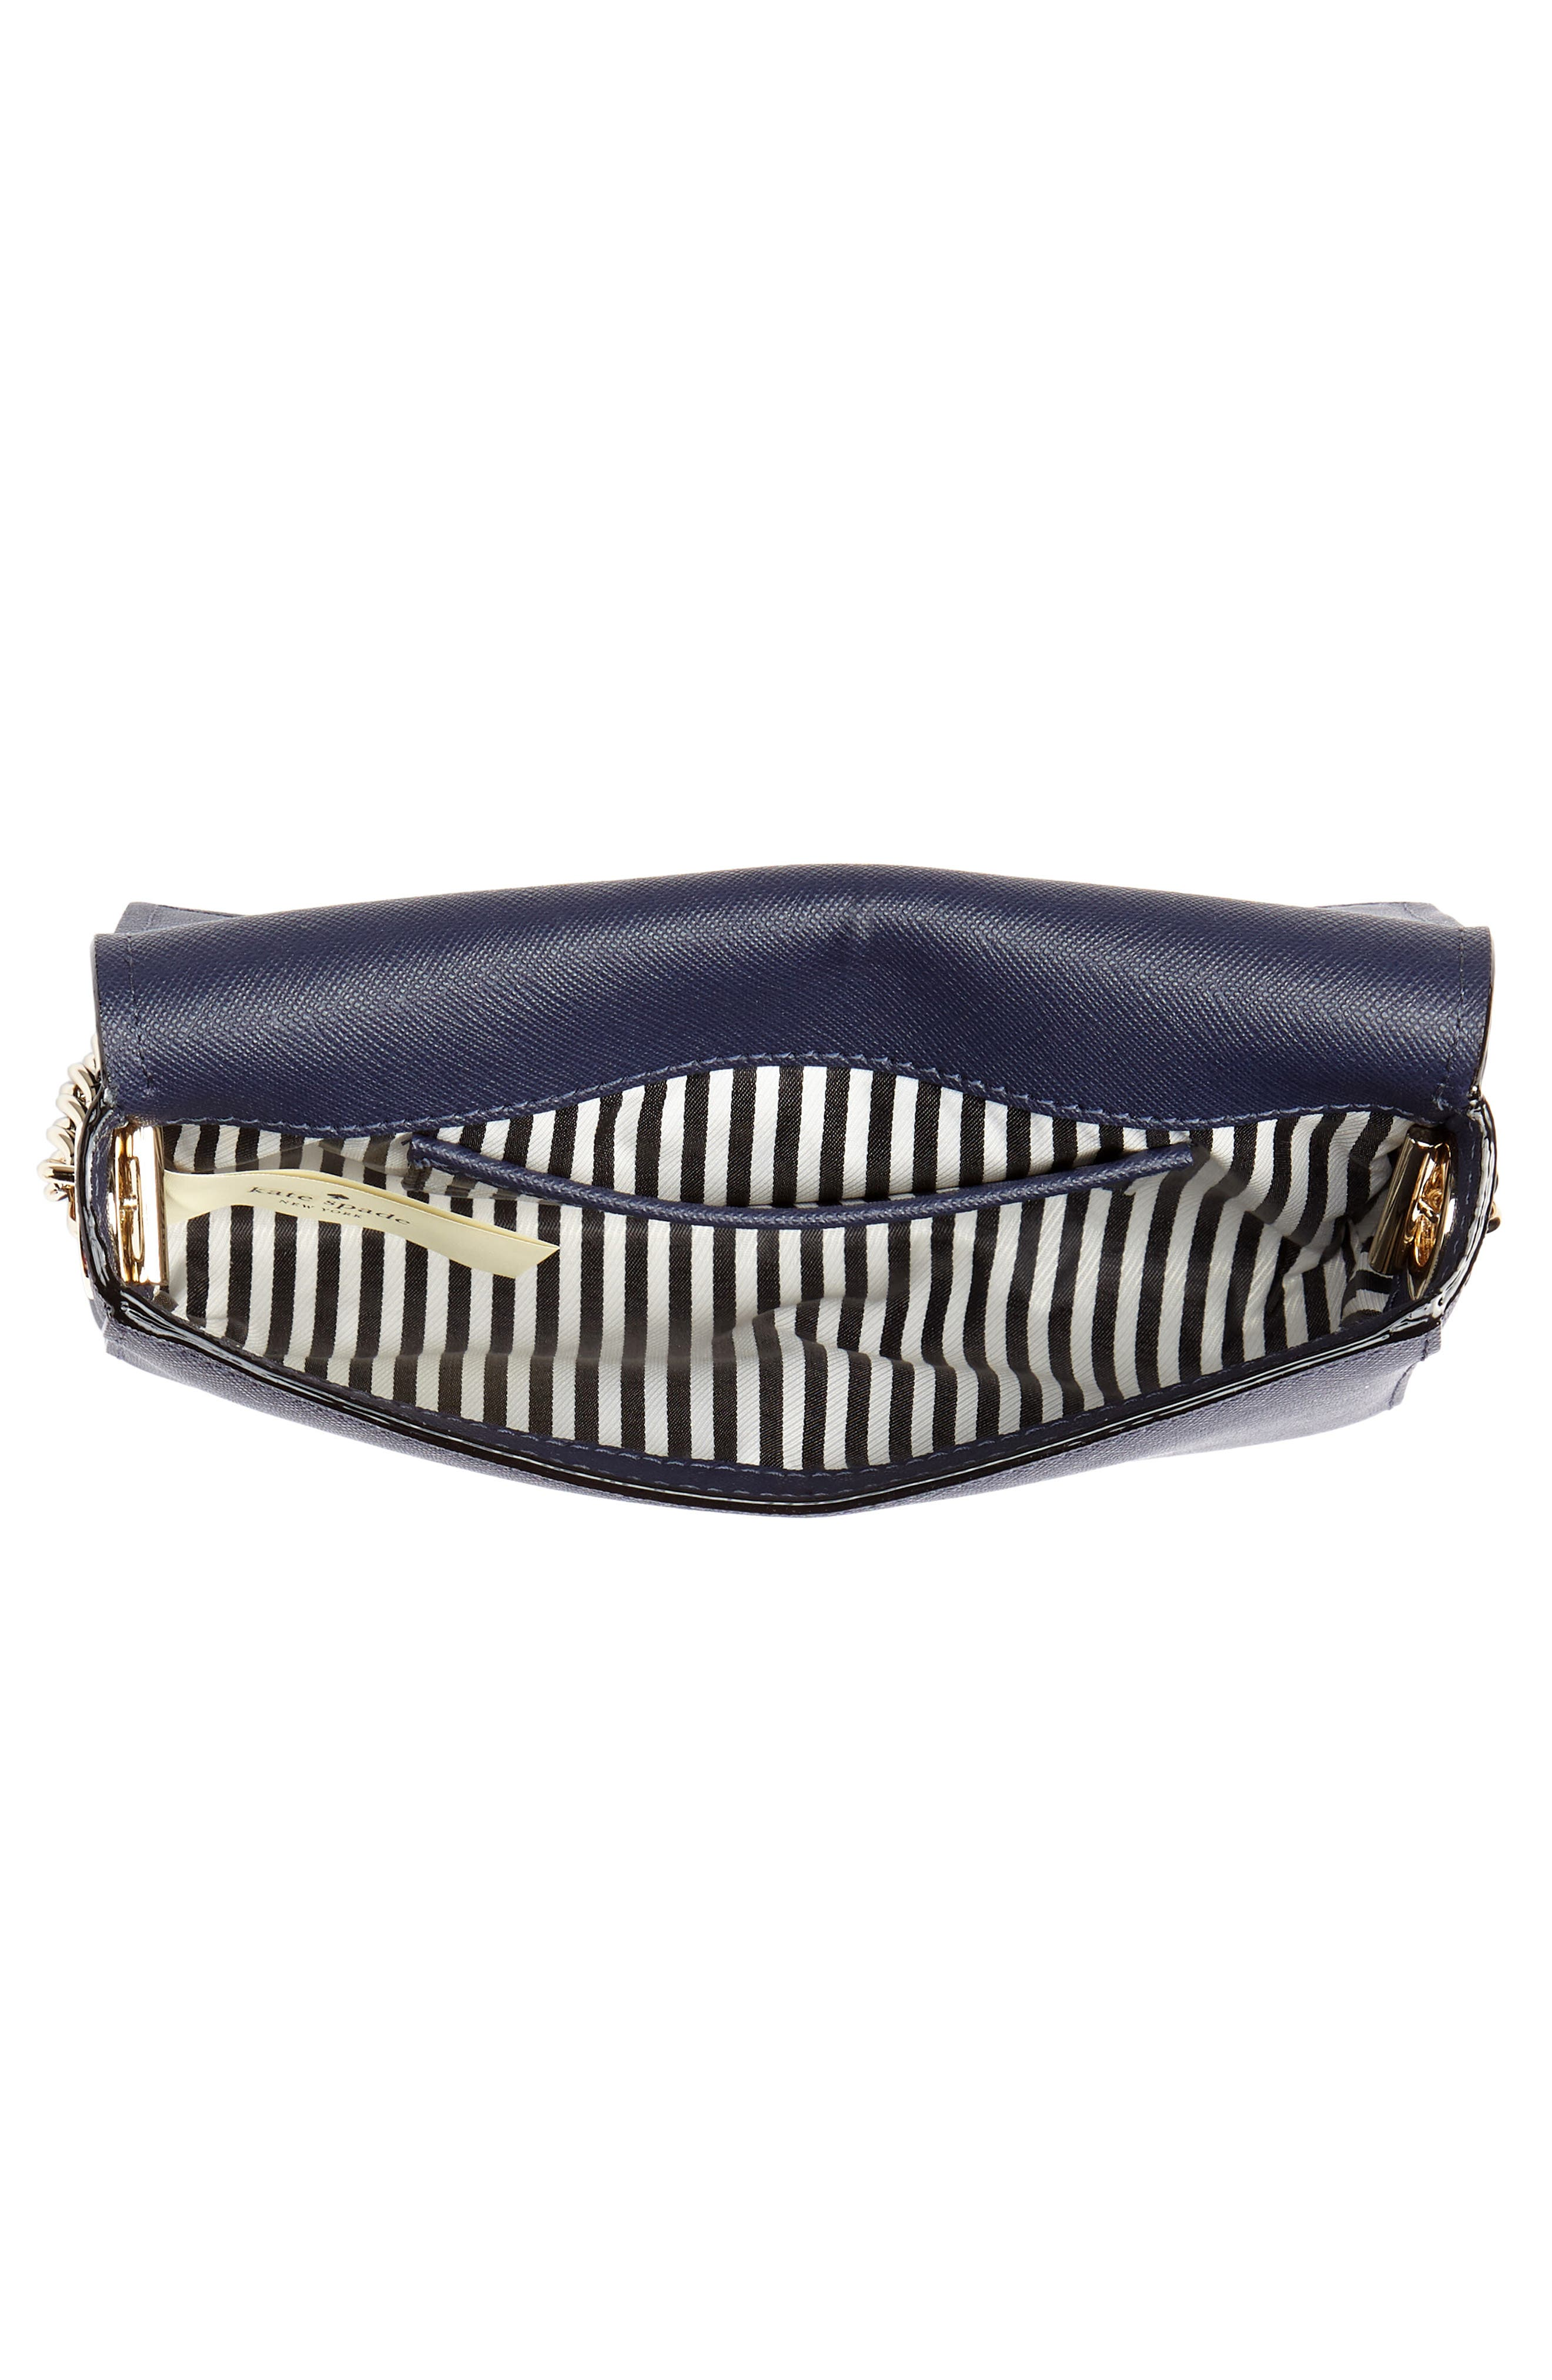 cameron street - delilah belt bag,                             Alternate thumbnail 4, color,                             BLAZER BLUE